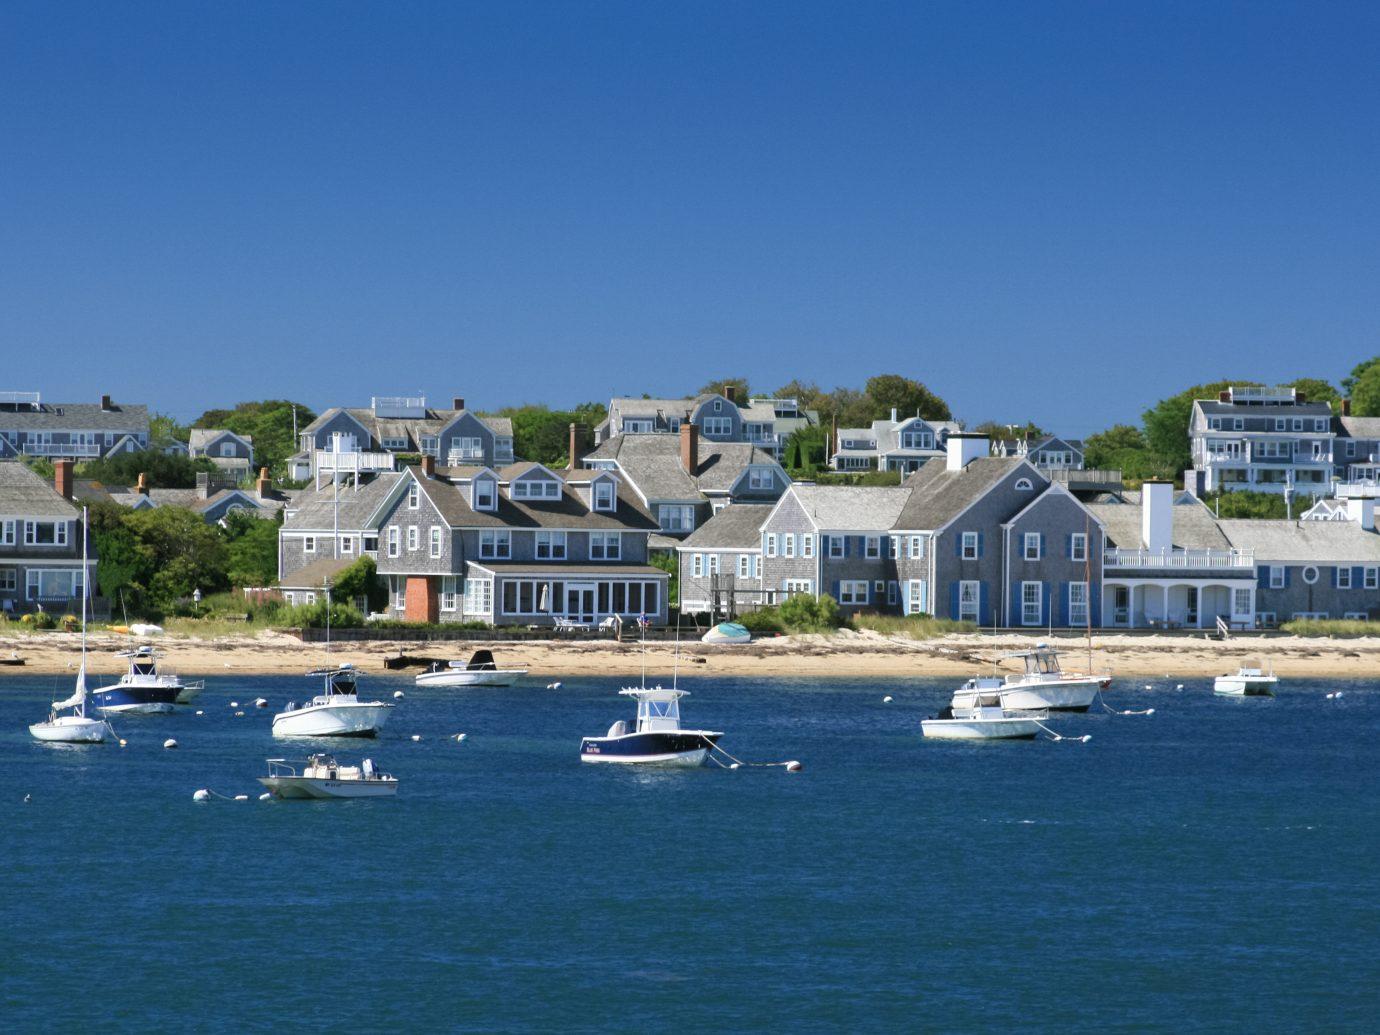 Boats and waterfront Houses, Nantucket, Massachusetts